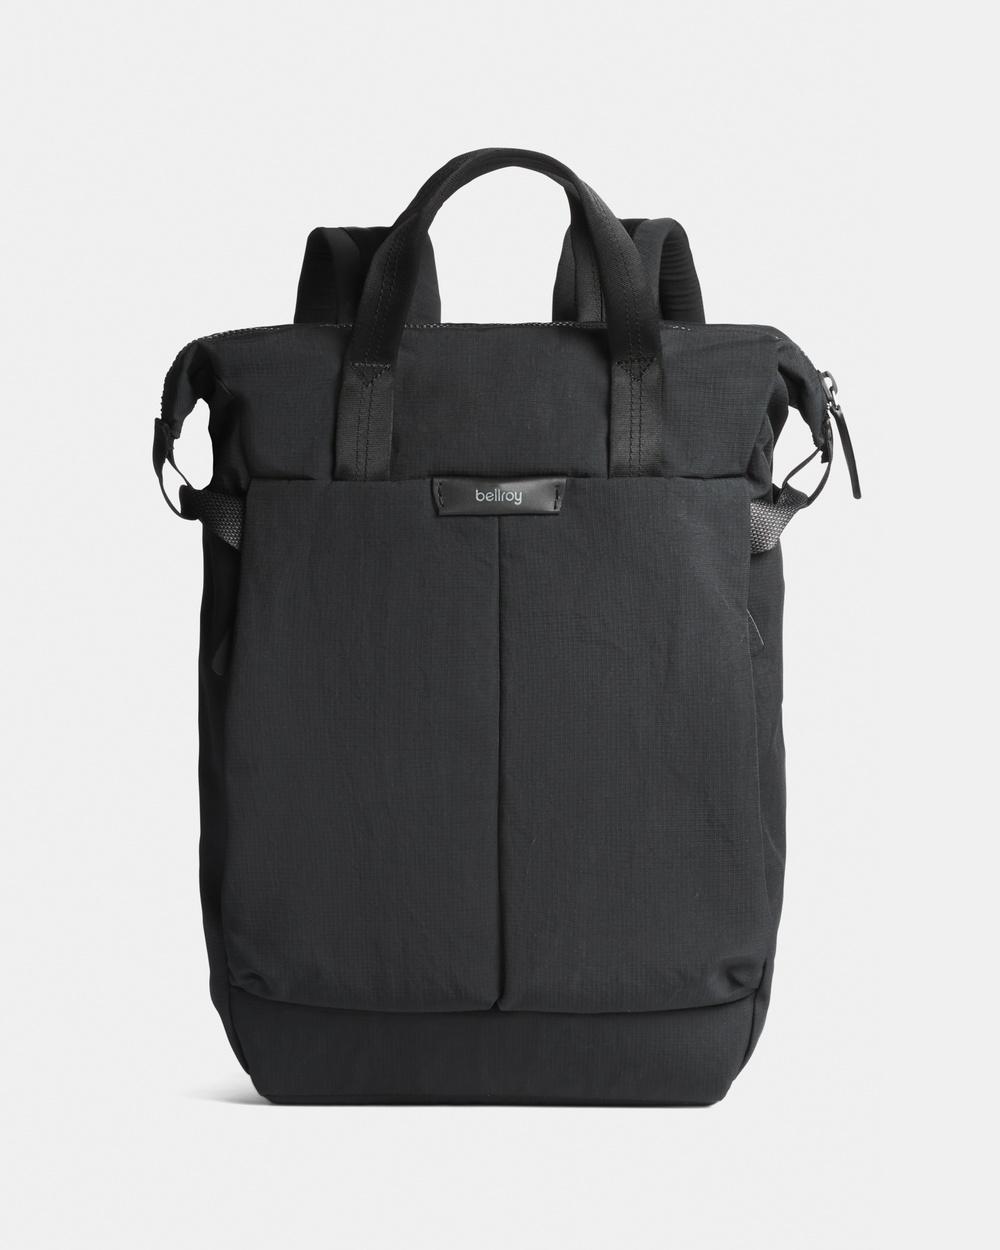 Bellroy Tokyo Totepack Compact Backpacks Black